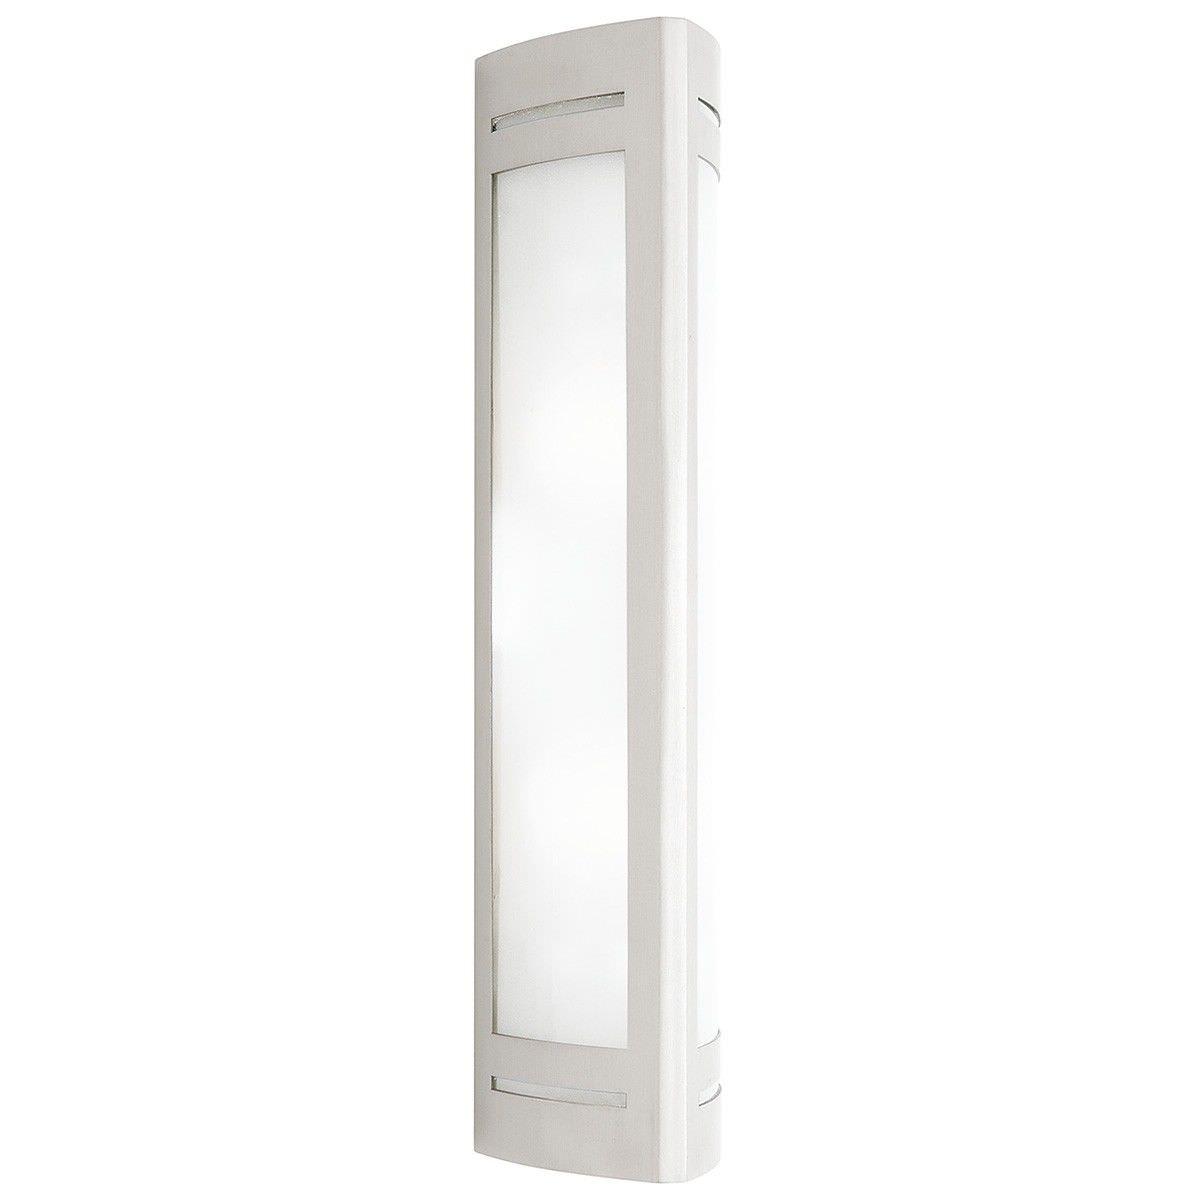 Linear 316 Stainless Steel 2 Light IP44 Outdoor Wall Light